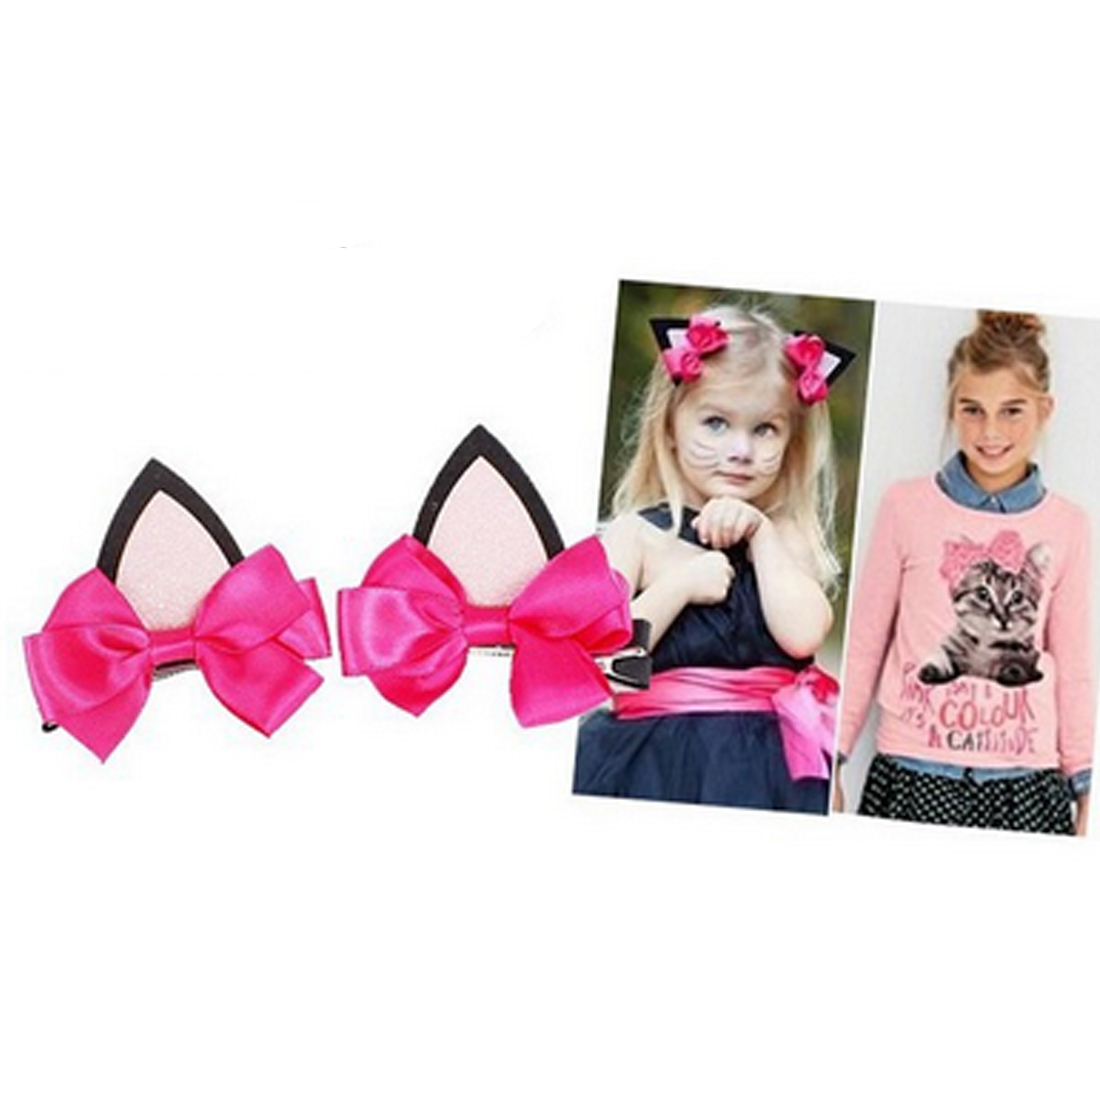 2PCS=1 Pair Children Baby Girls Hair Accessories Clip Kids Hairpins Barrettes Bow   Headwear   Flower Cat Ears